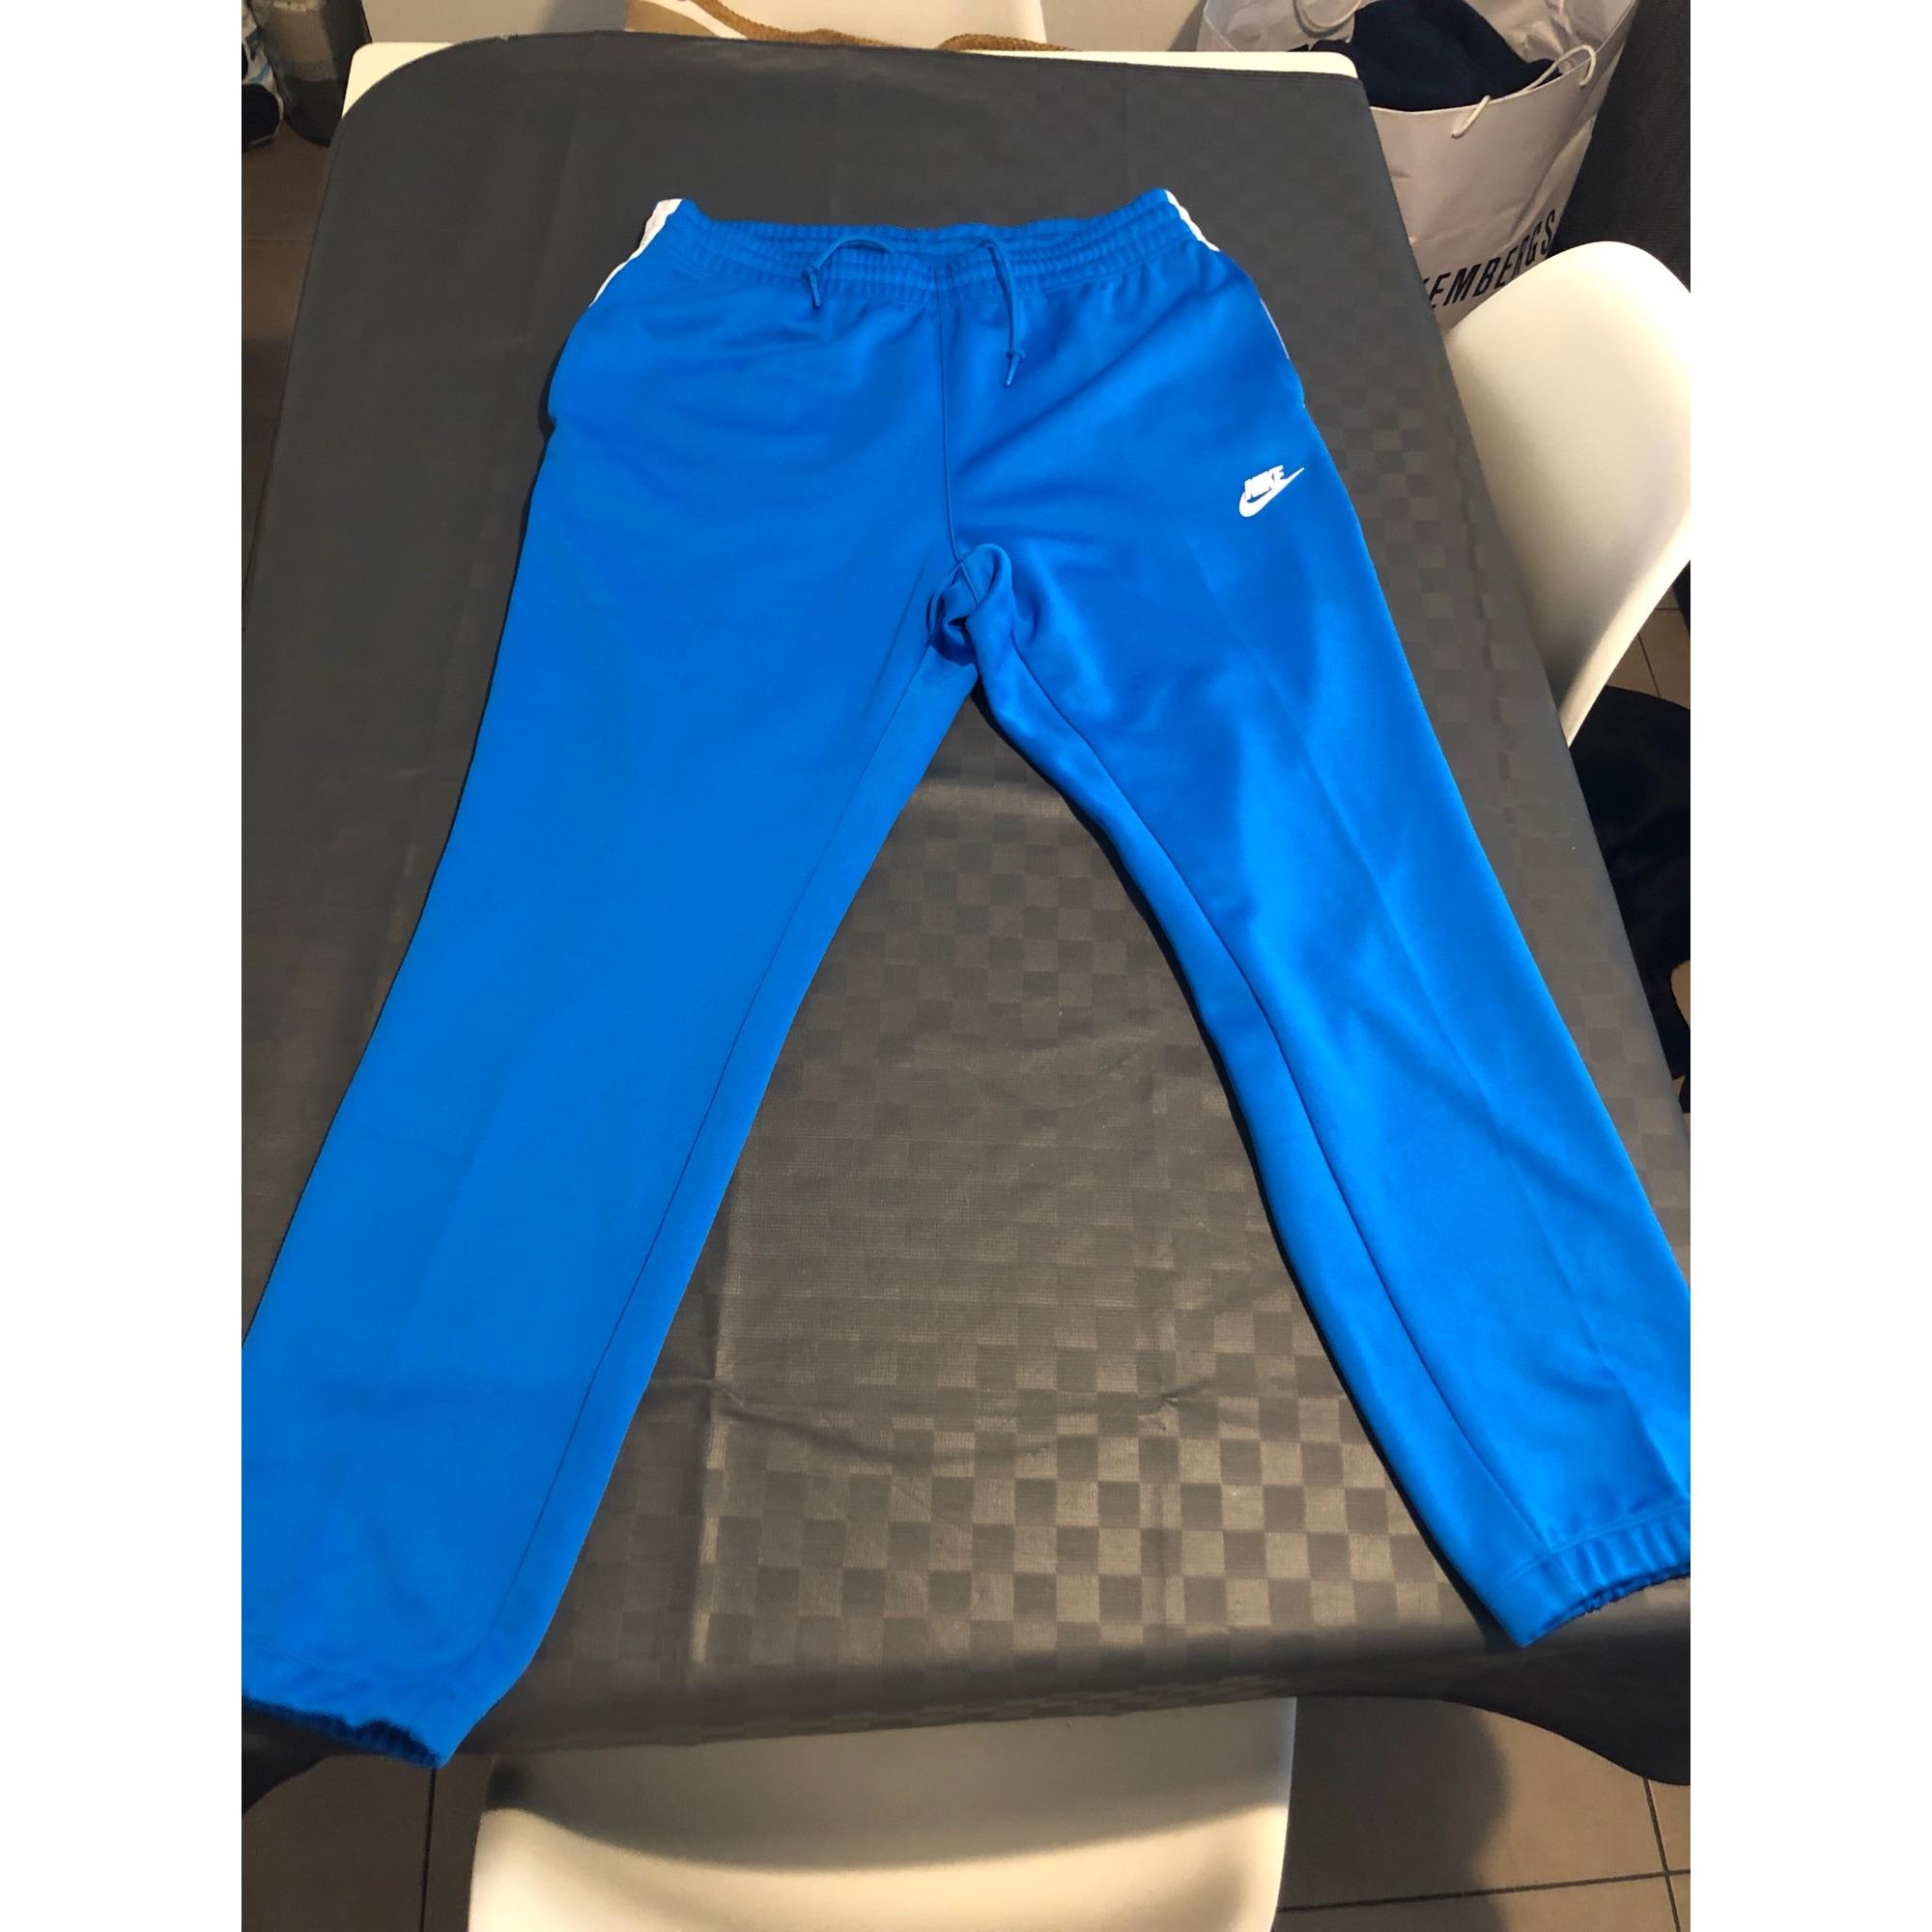 pantalon nike bleu marie